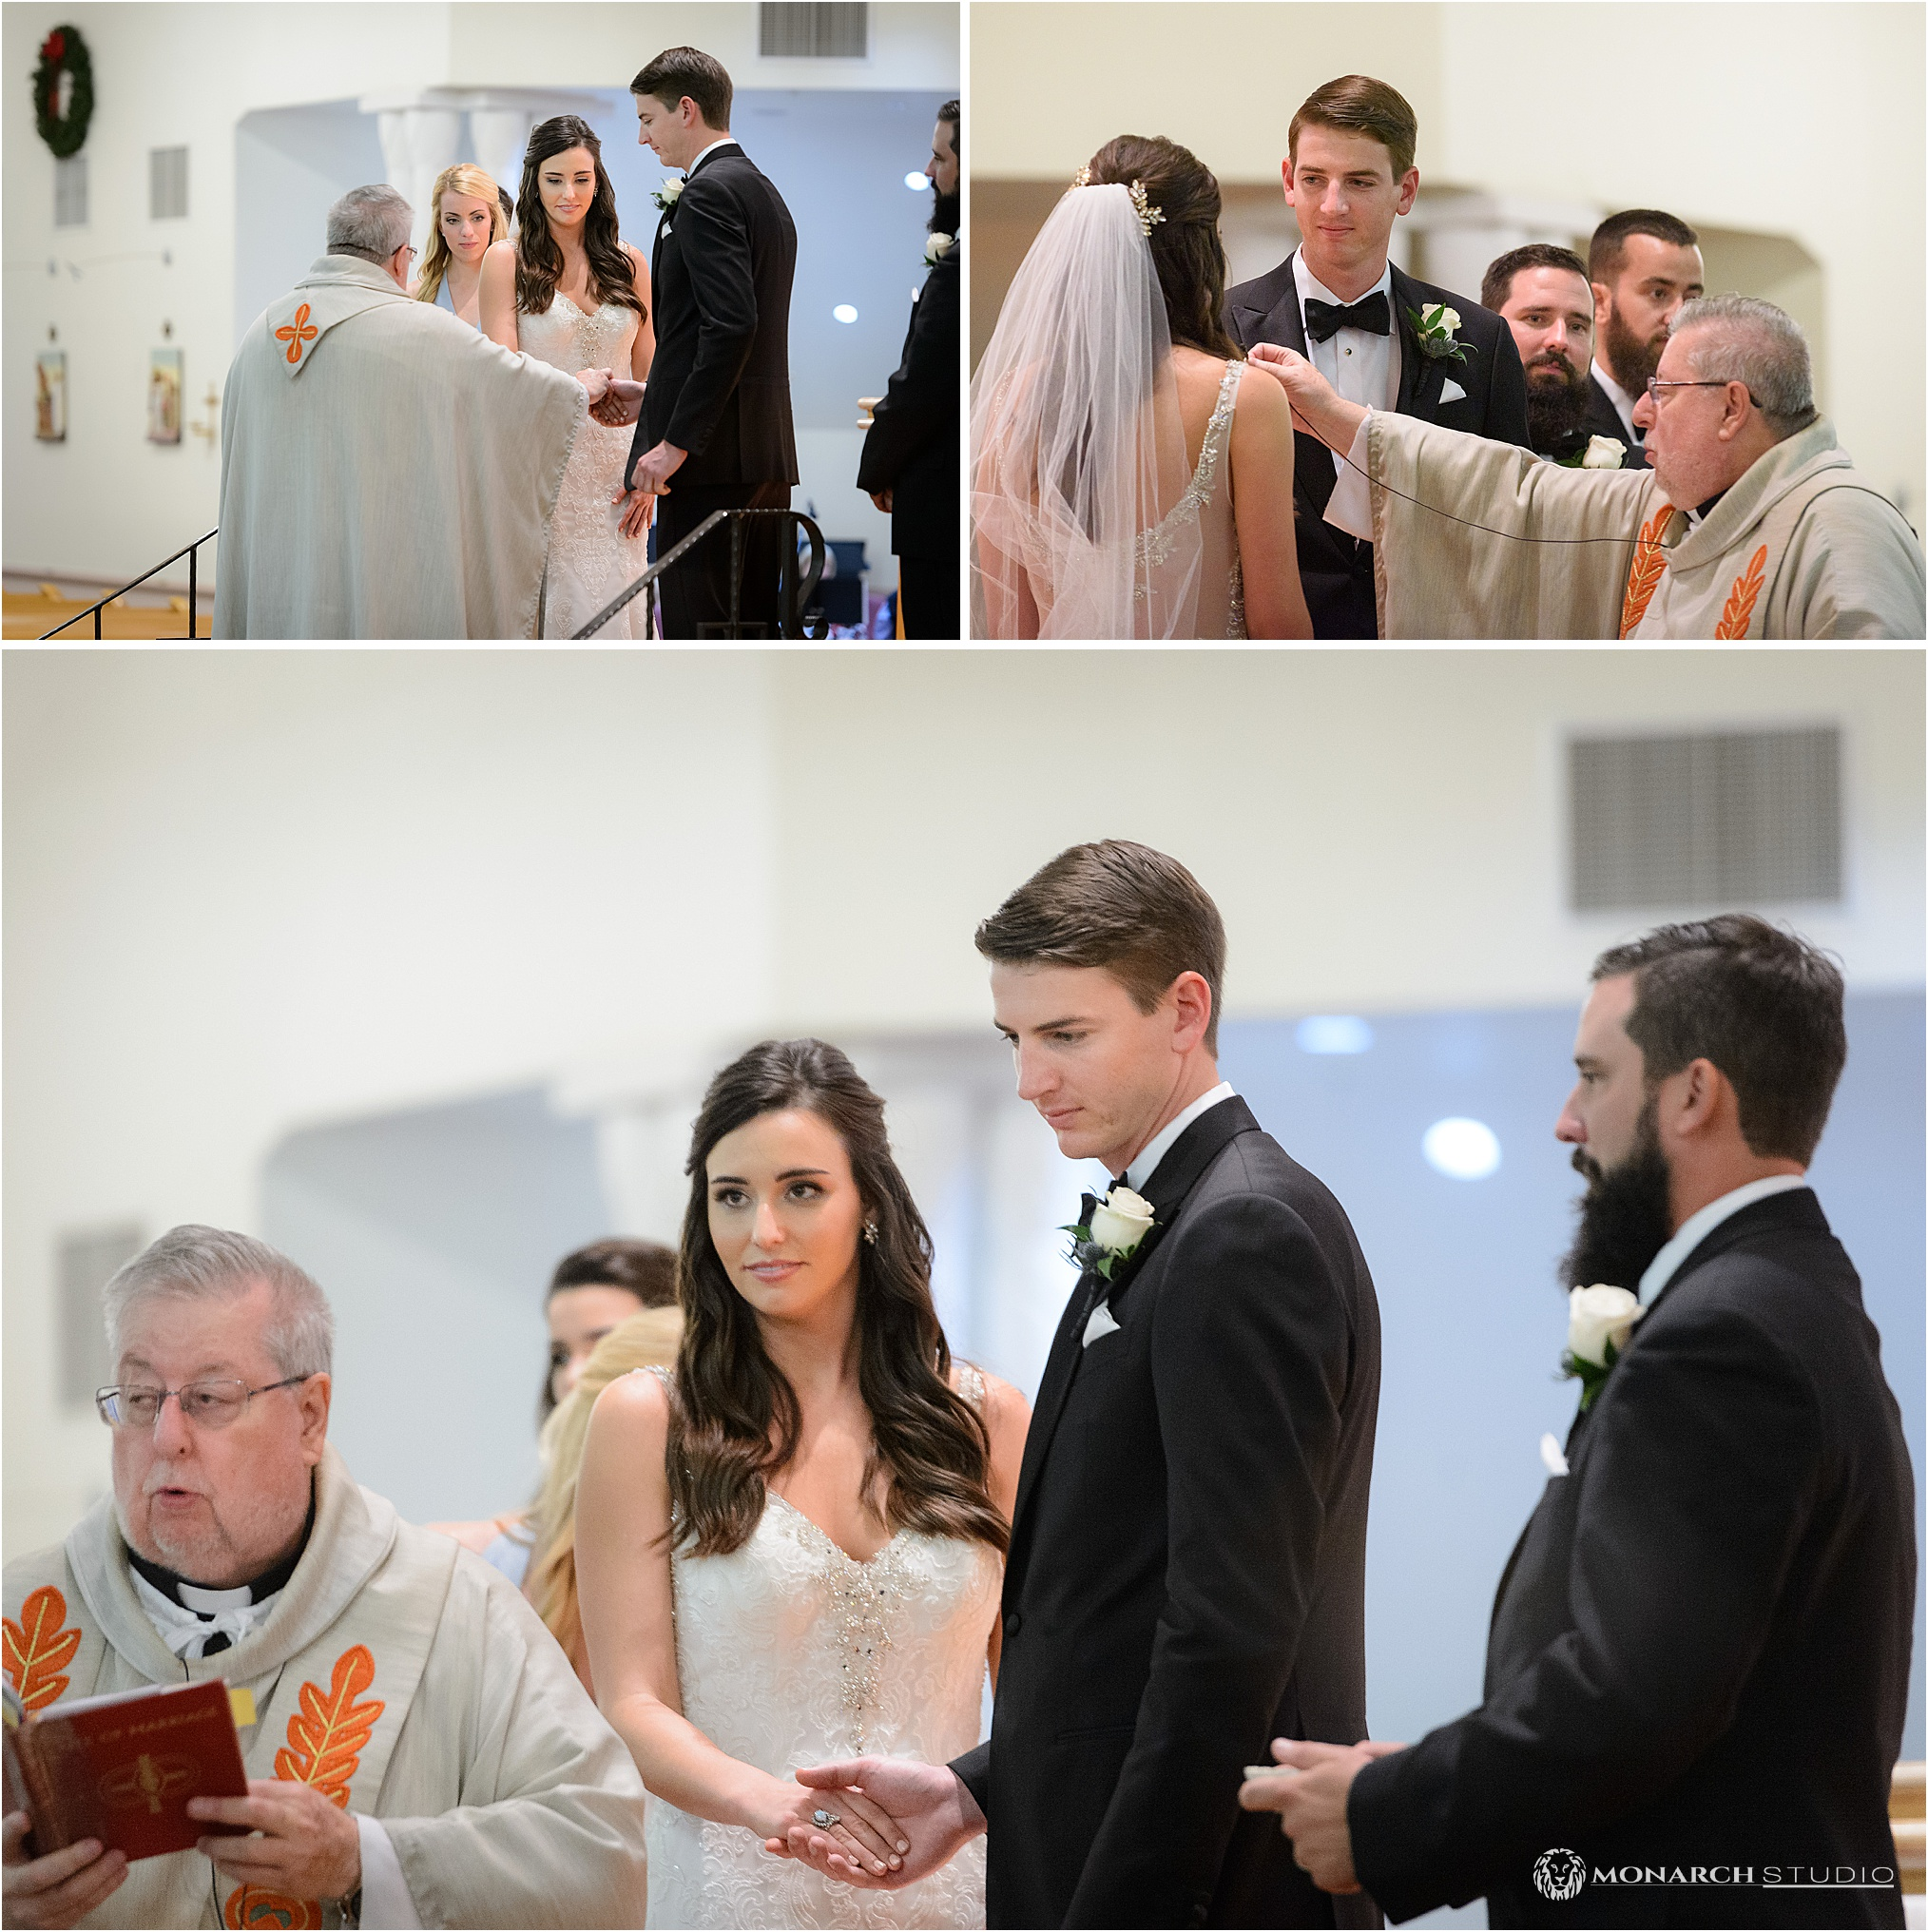 saint-augustine-wedding-photographer-treasury-039.jpg